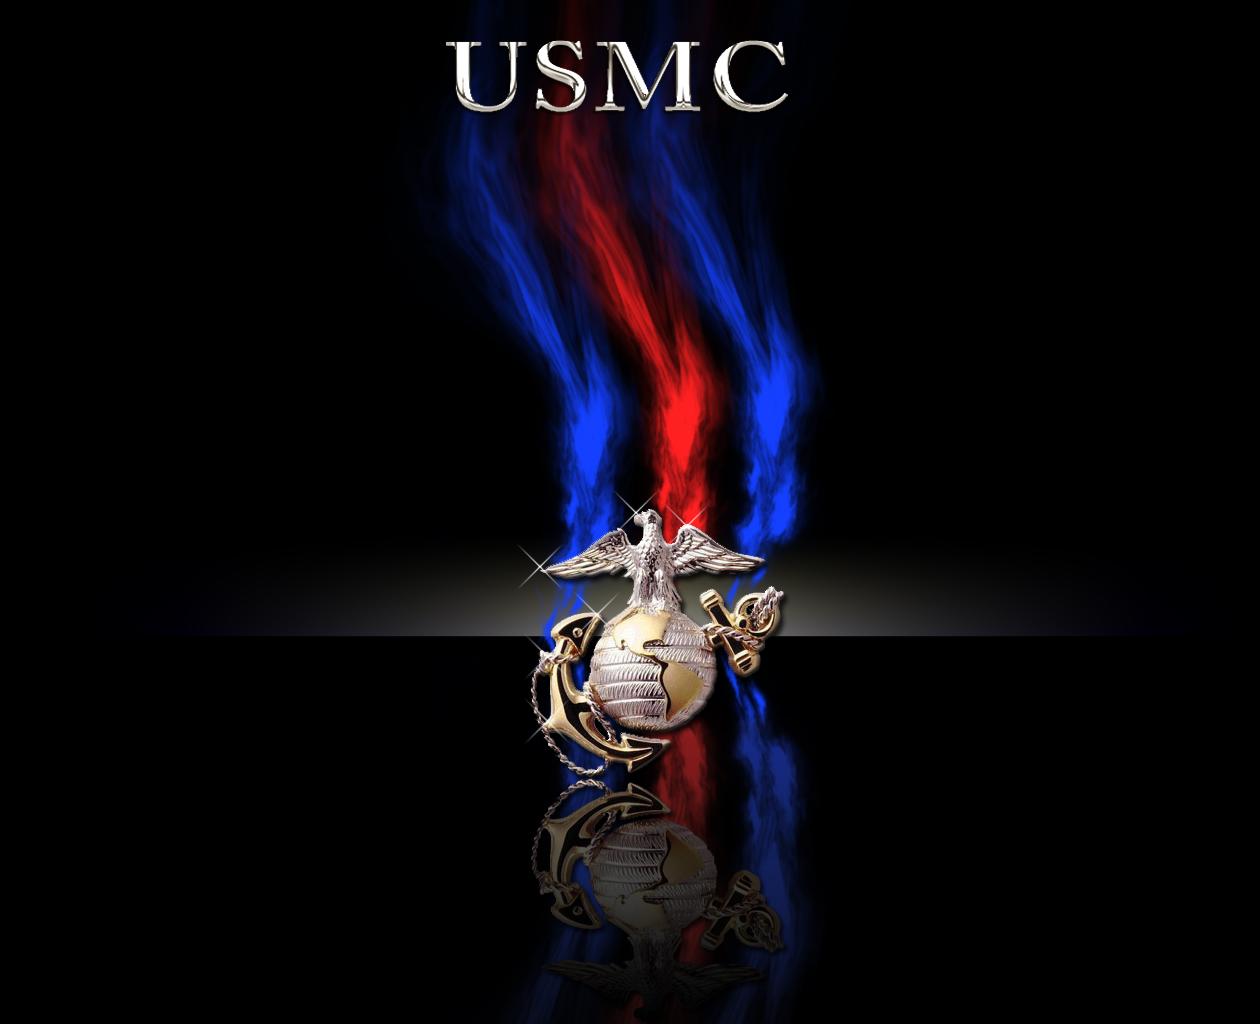 us marine corps the few us marine corps 1260x1024